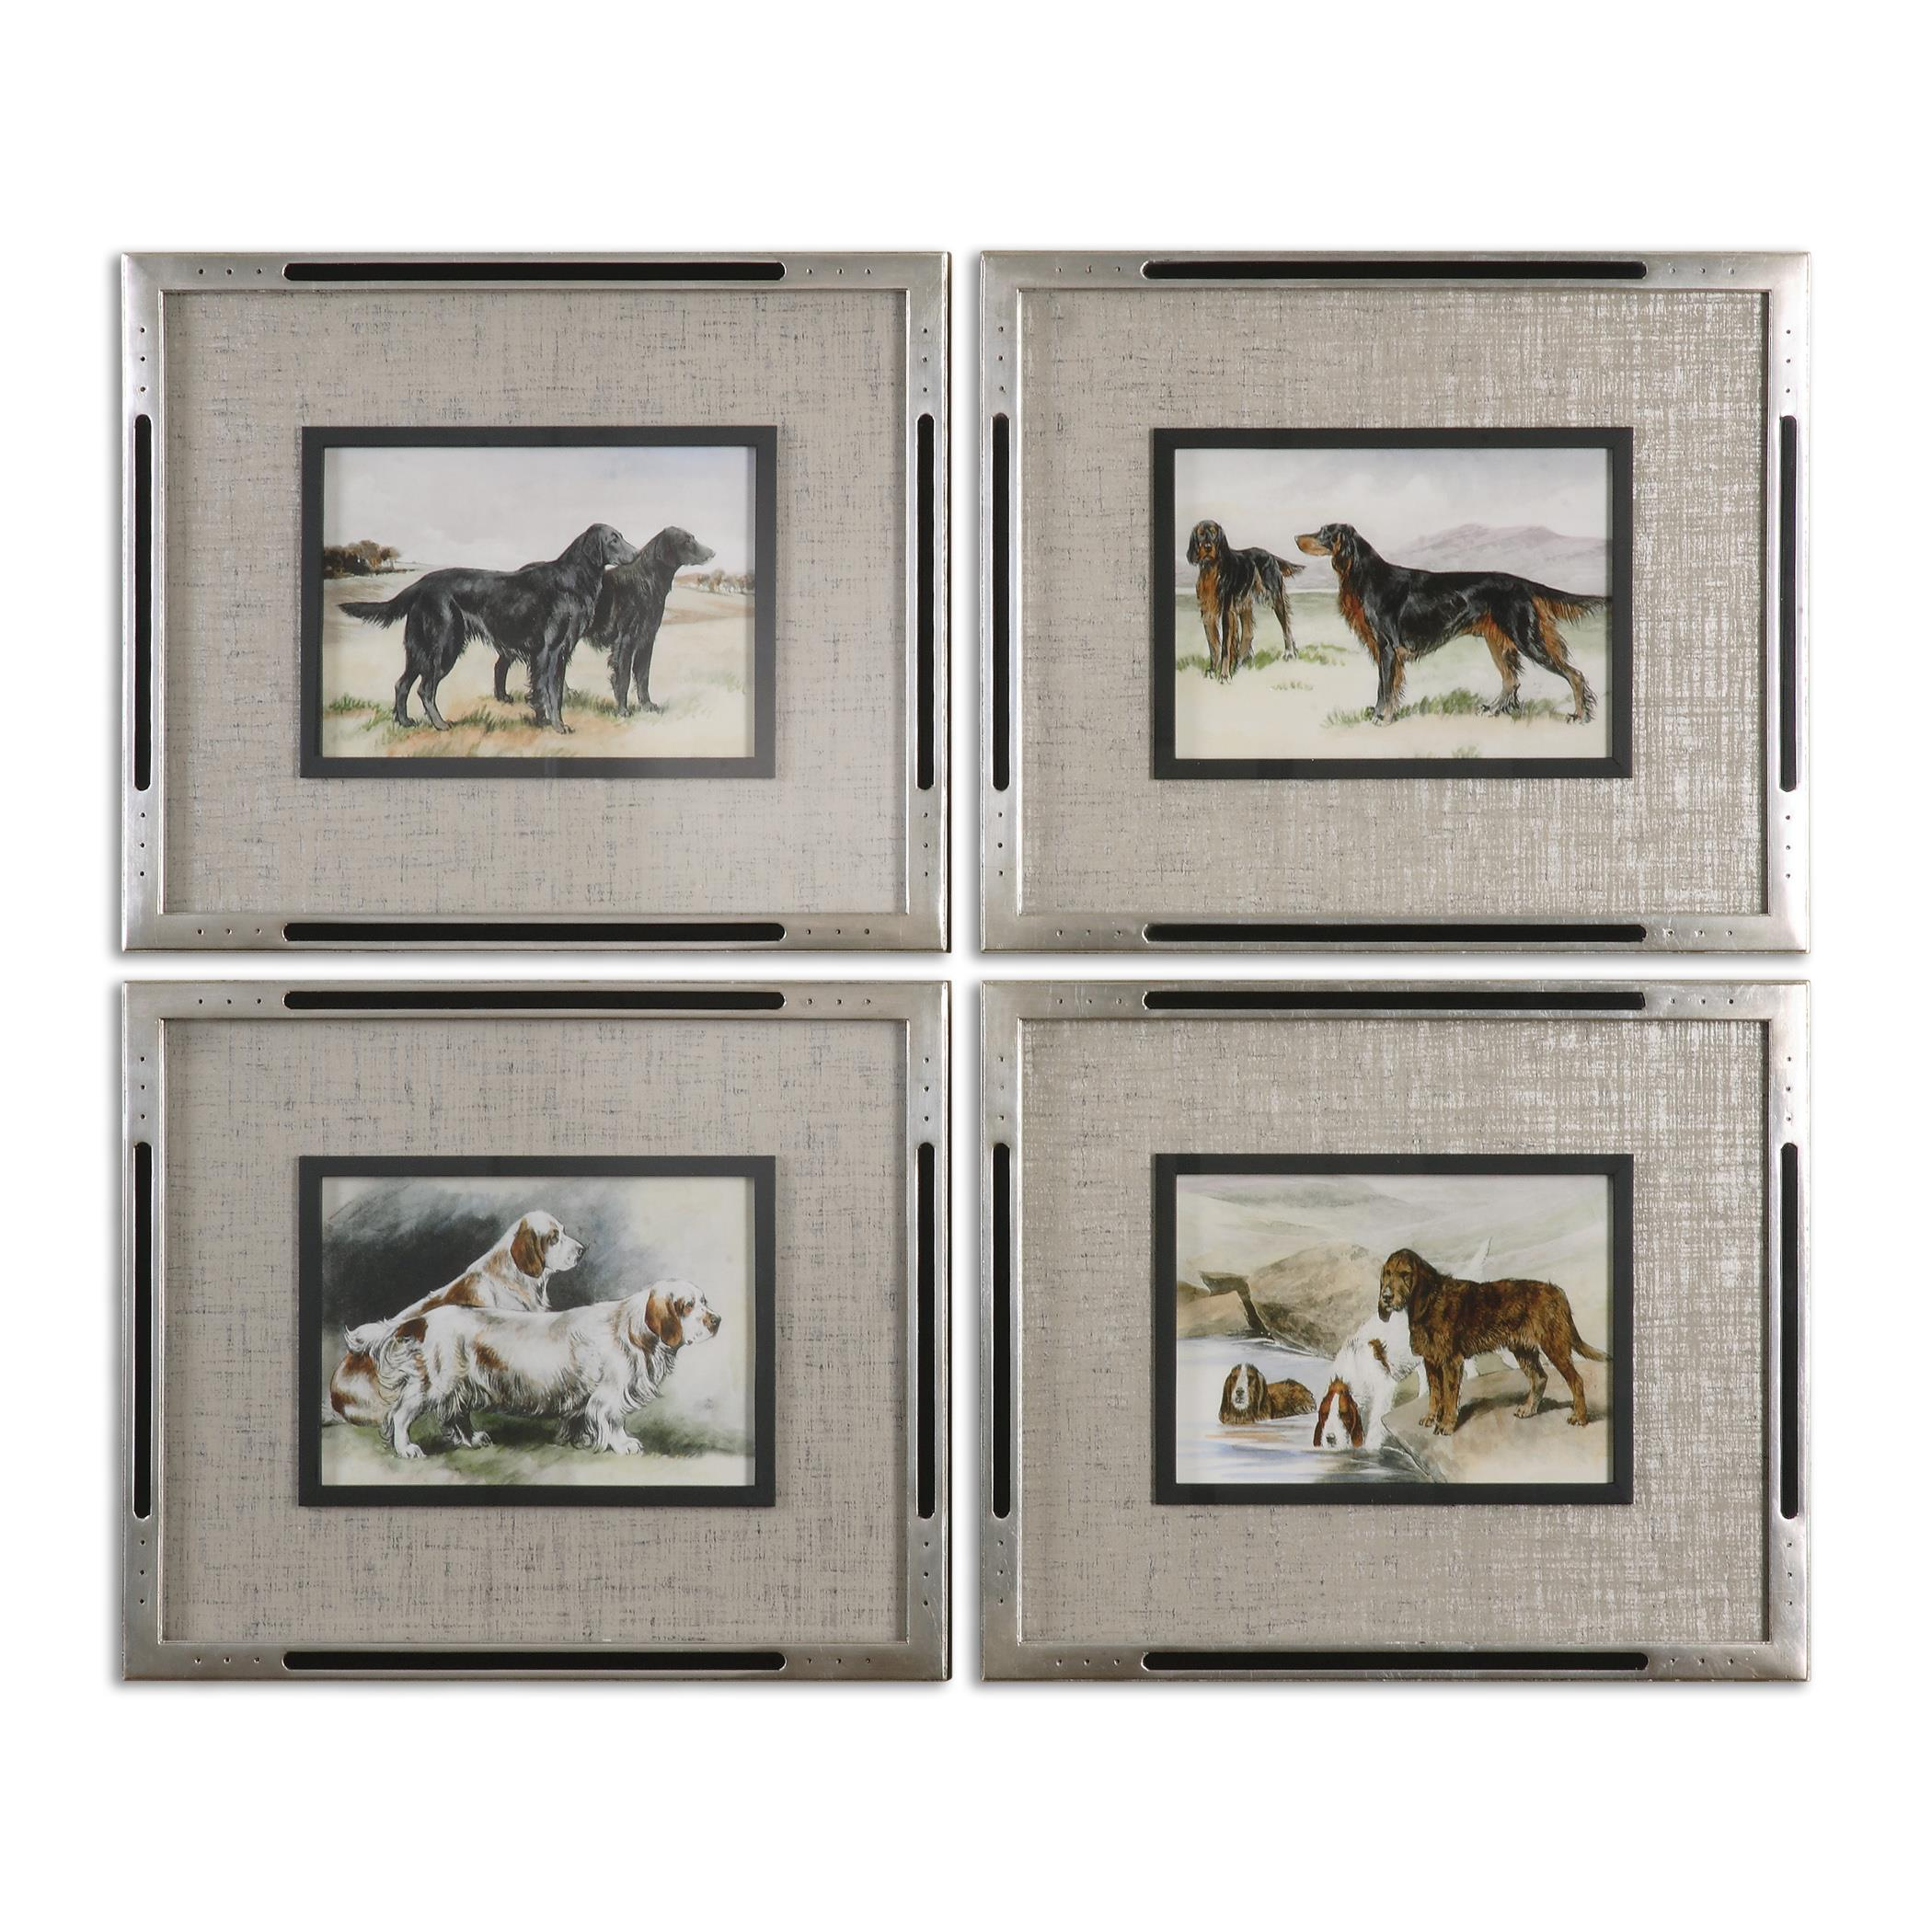 Uttermost Art Working Dogs Framed Art, S/4 - Item Number: 41541